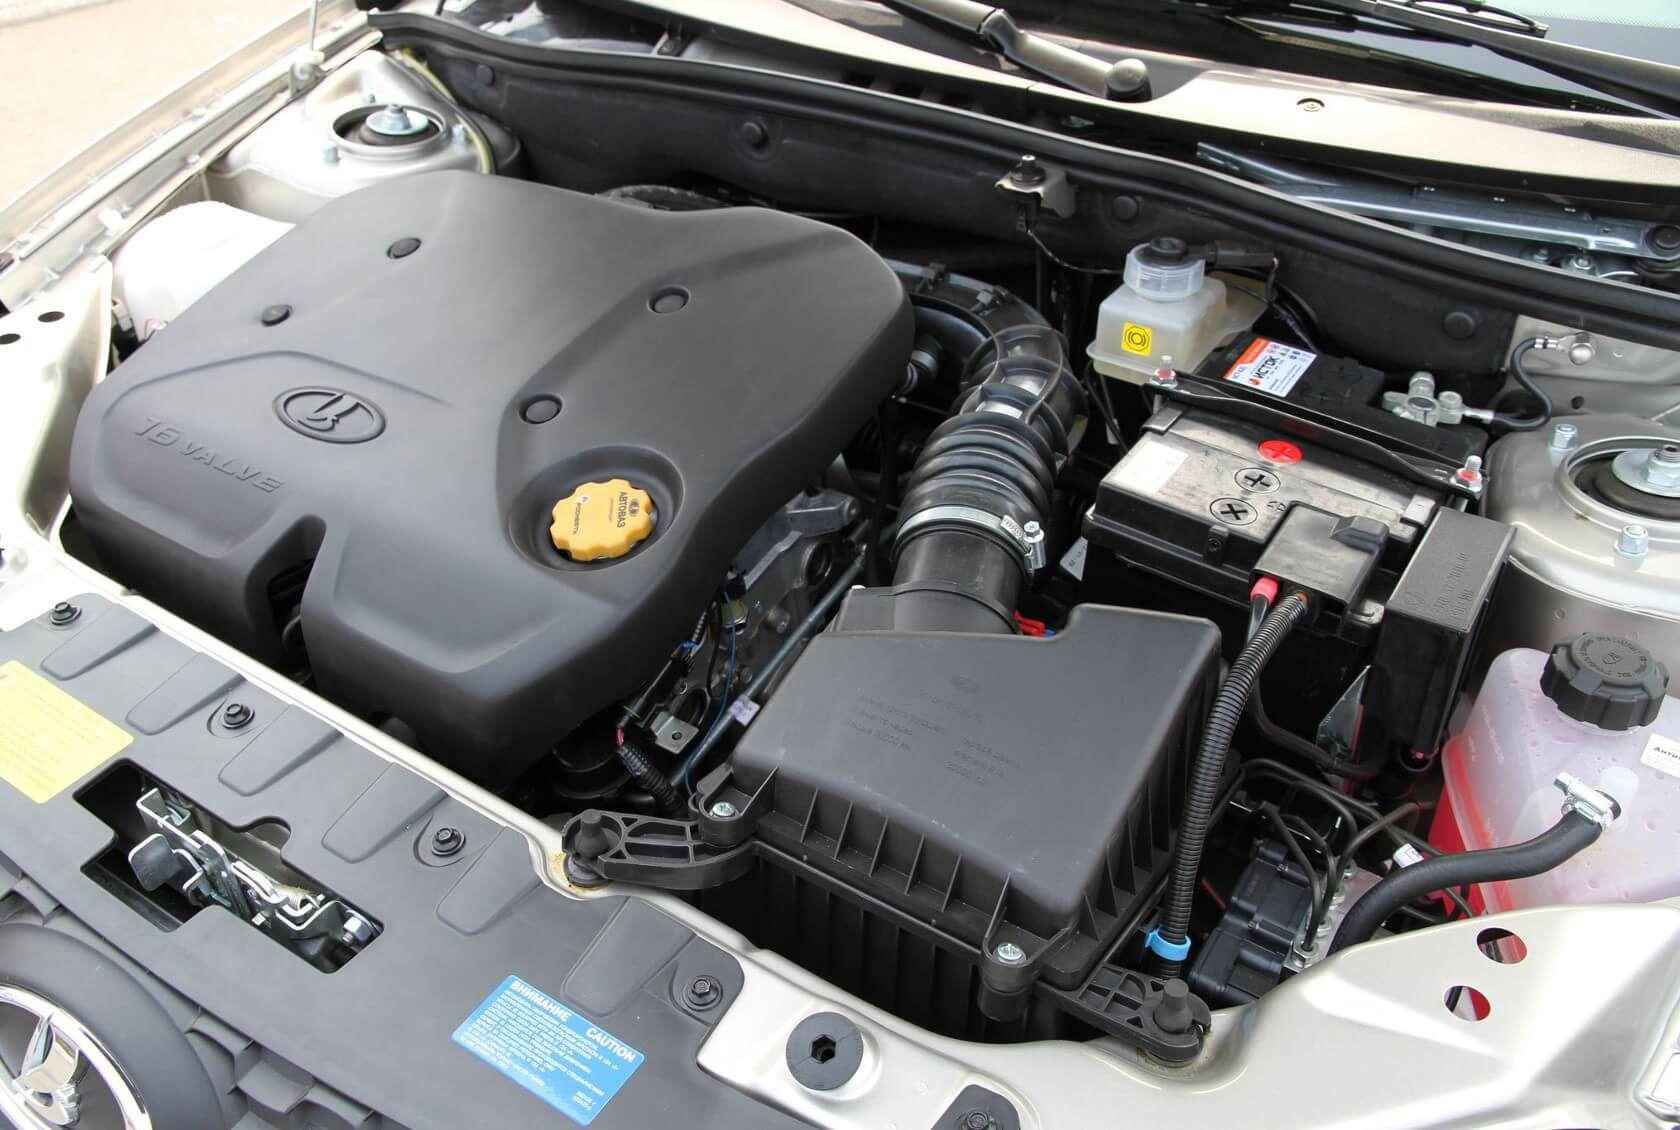 Технические БензиПодогрев двигателя на ладу калину